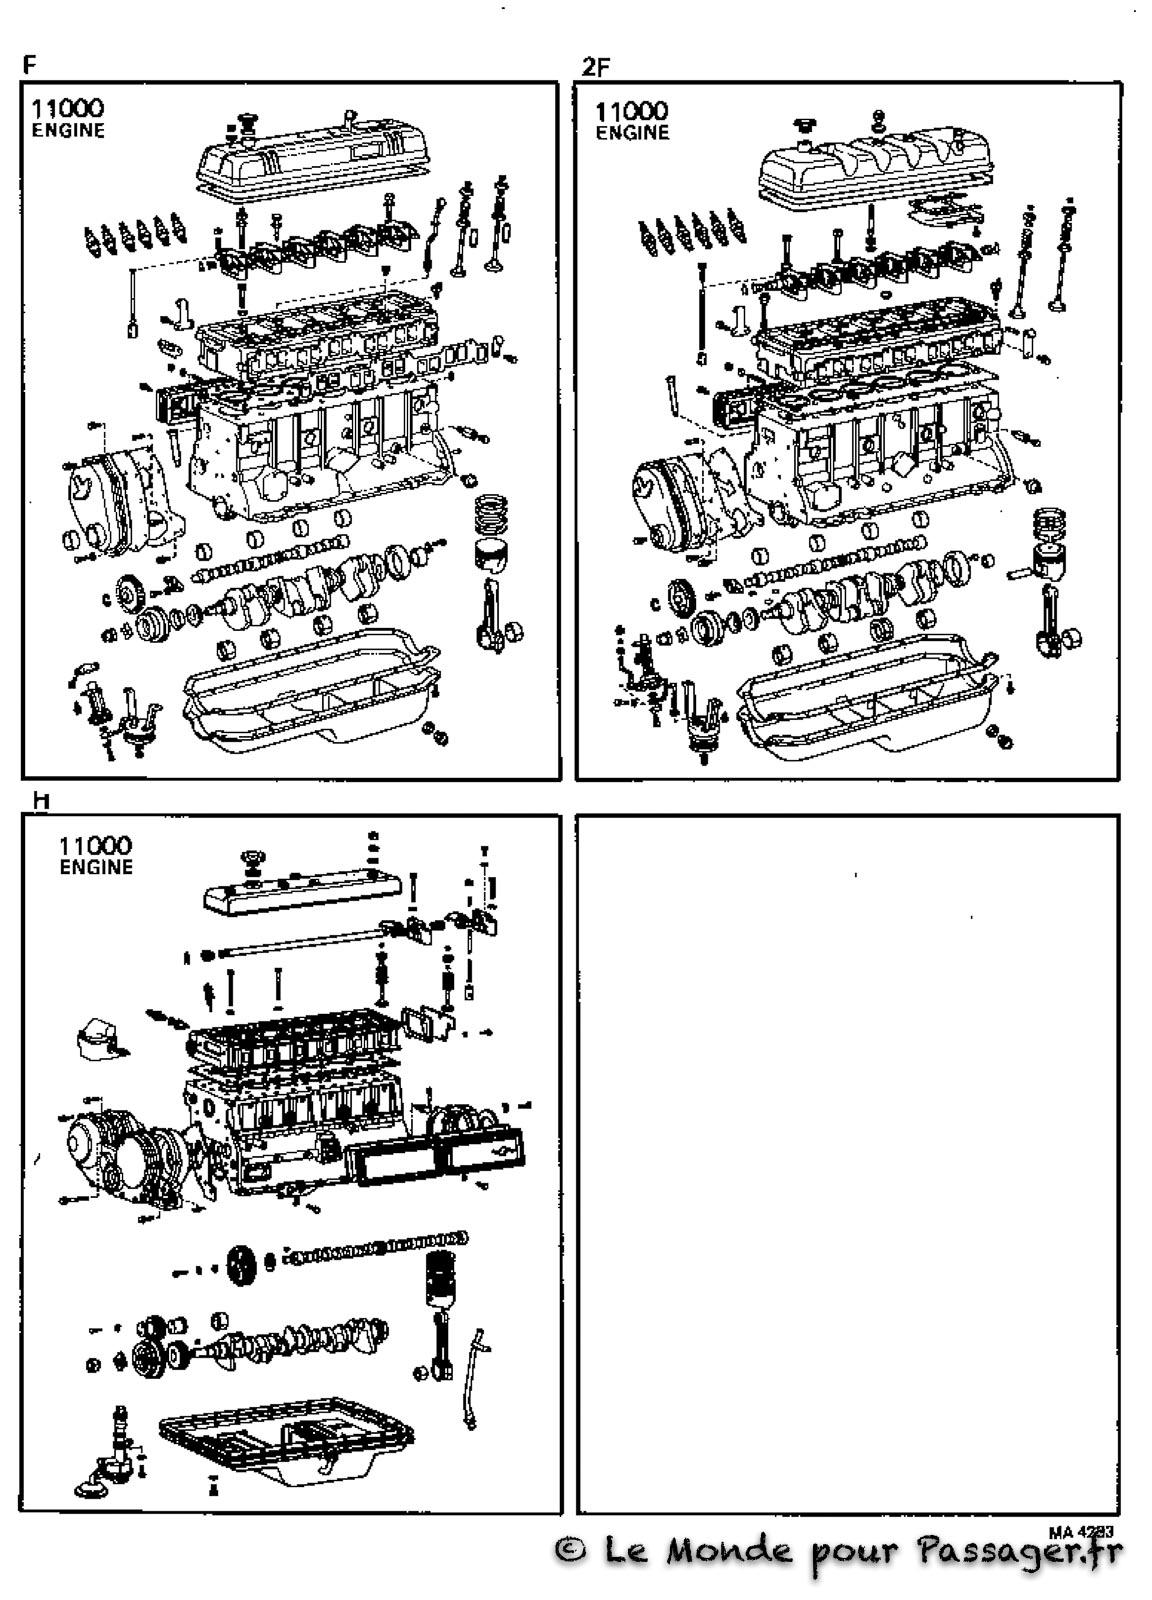 Fj55-Eclatés-Techniques085